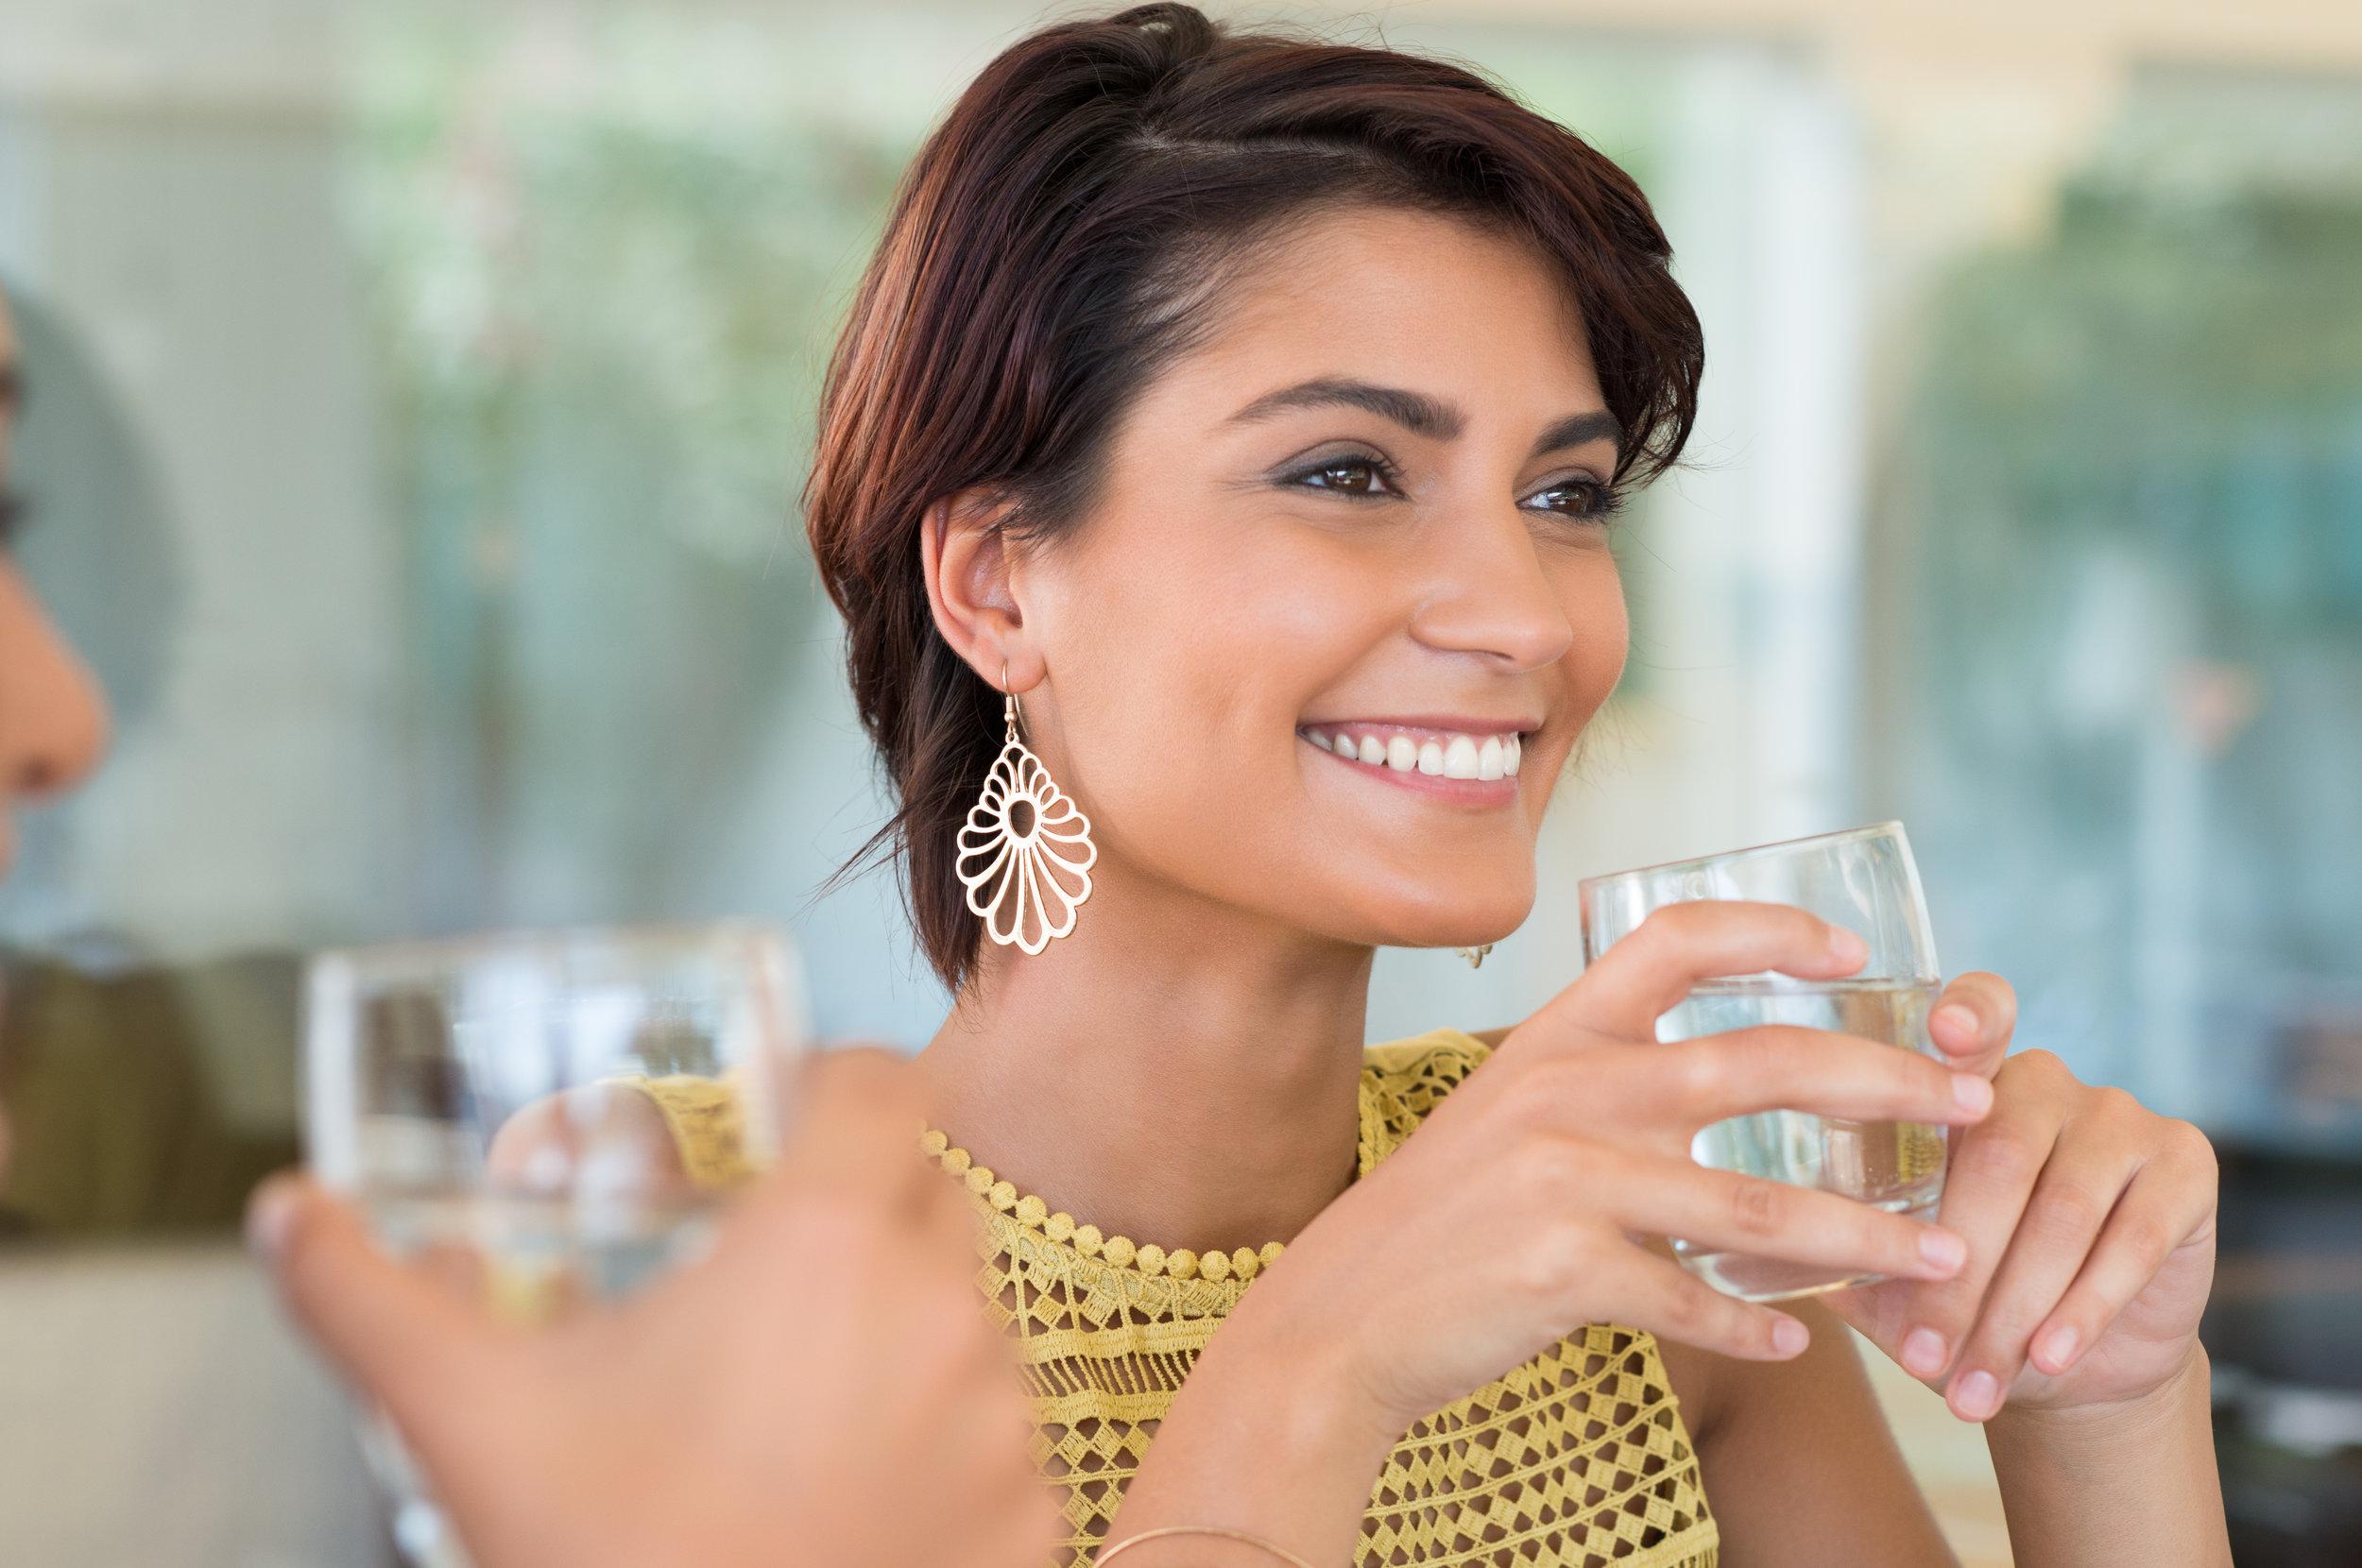 woman drinking water.jpeg